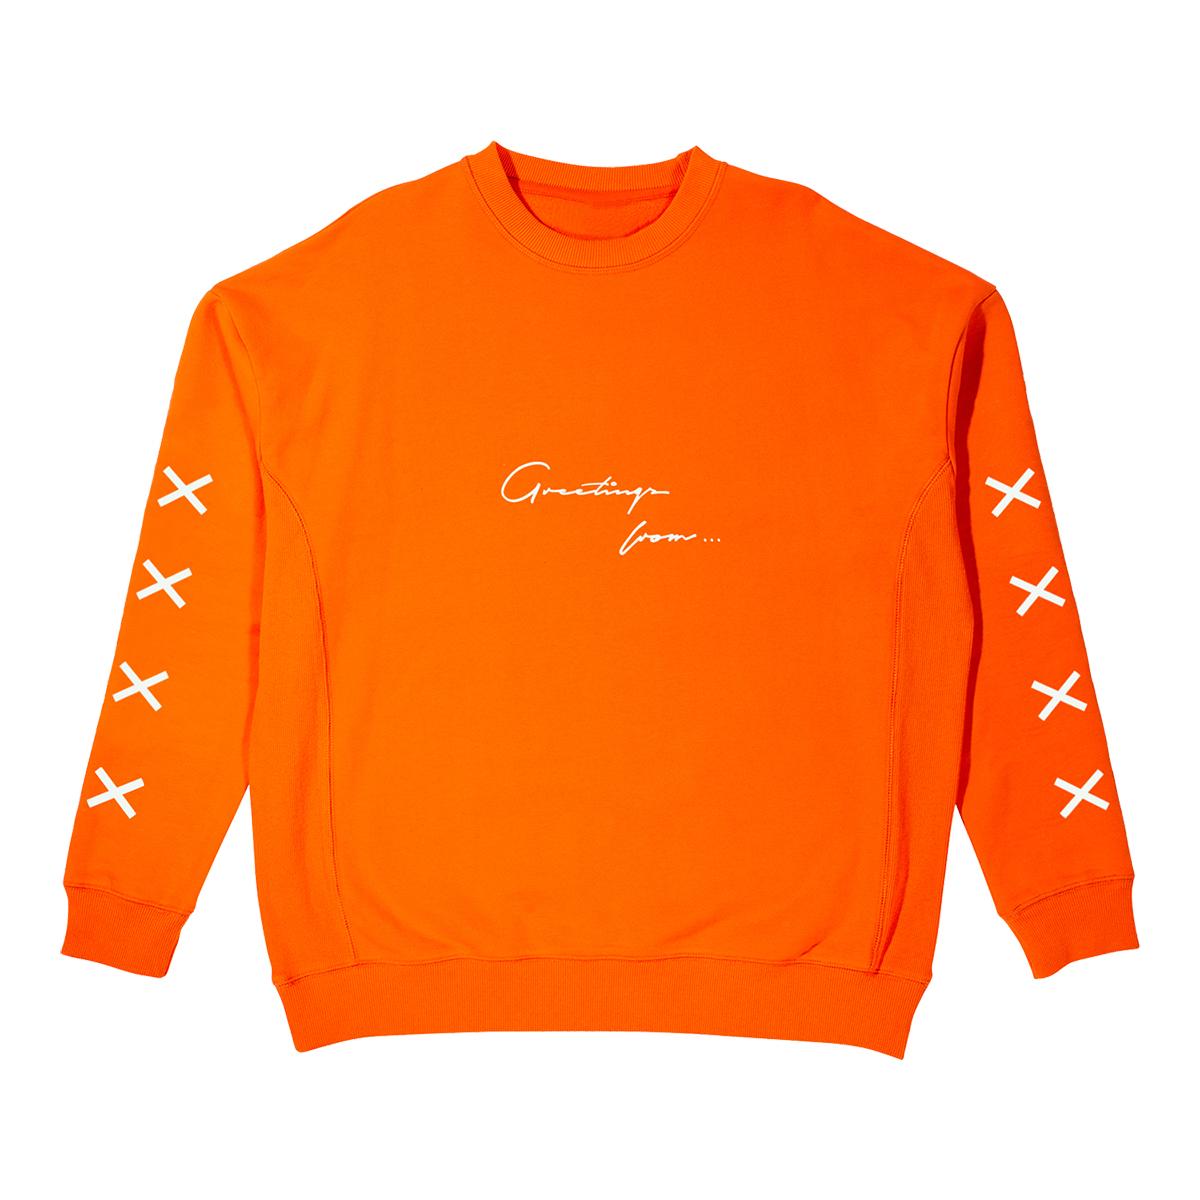 Father of Asahd Orange Crewneck Sweatshirt + Father of Asahd Album Download